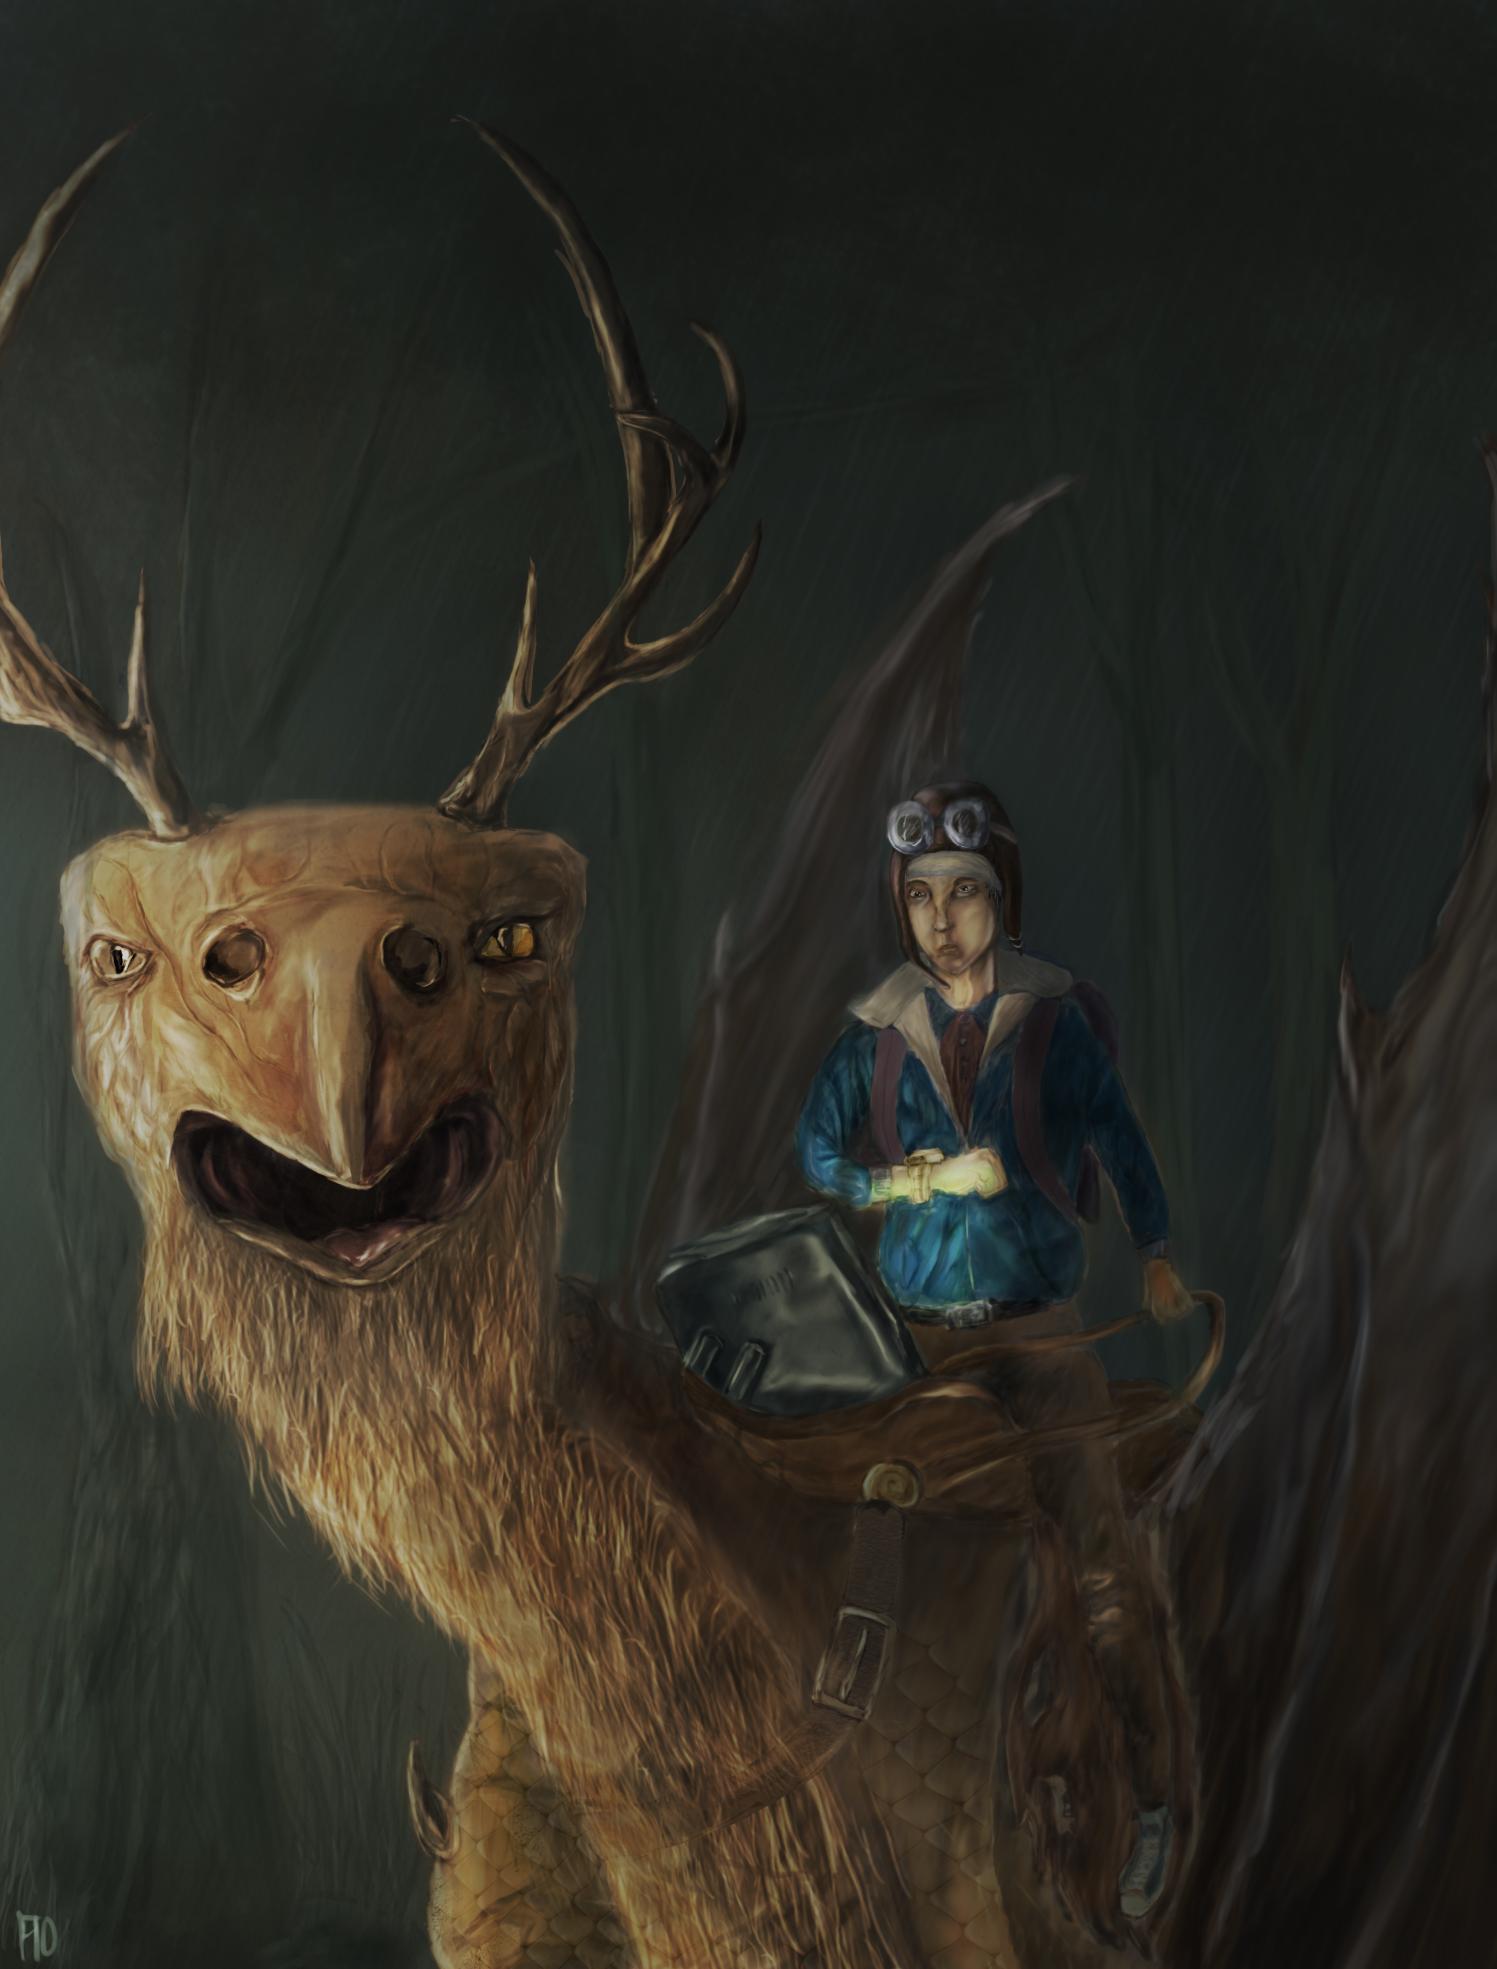 deerbirddragon and a guy